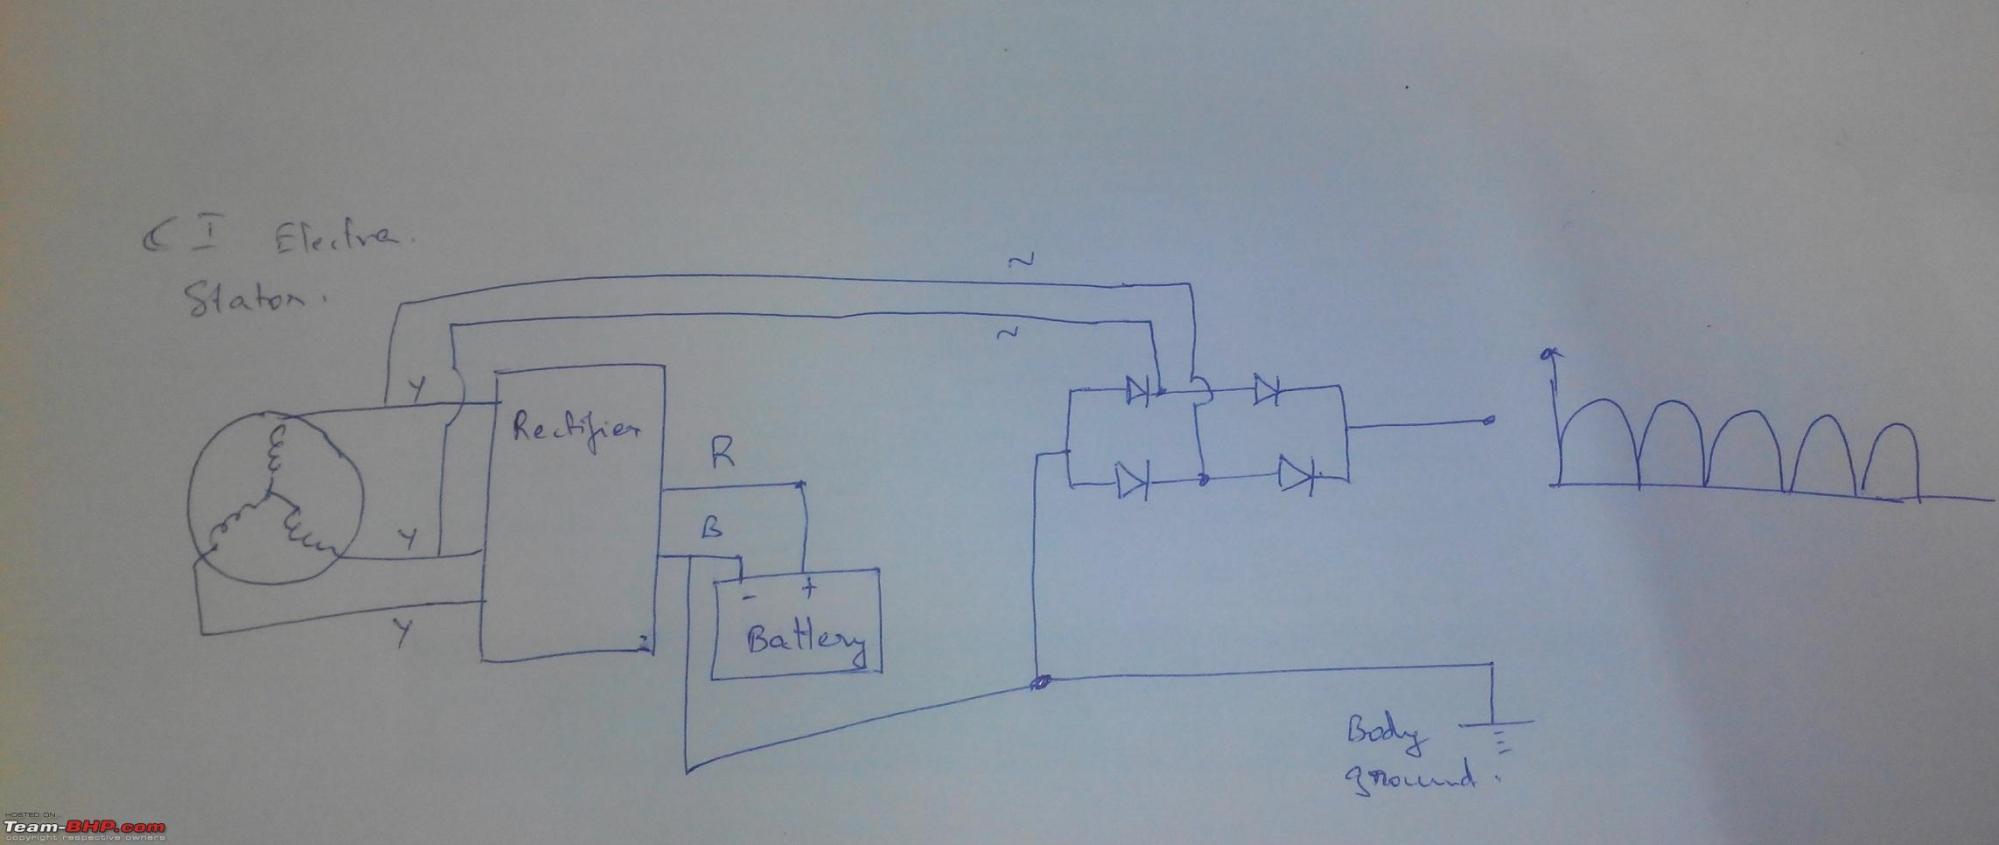 hight resolution of royal enfield 350 electra restoration upgrades dc regulation jpg